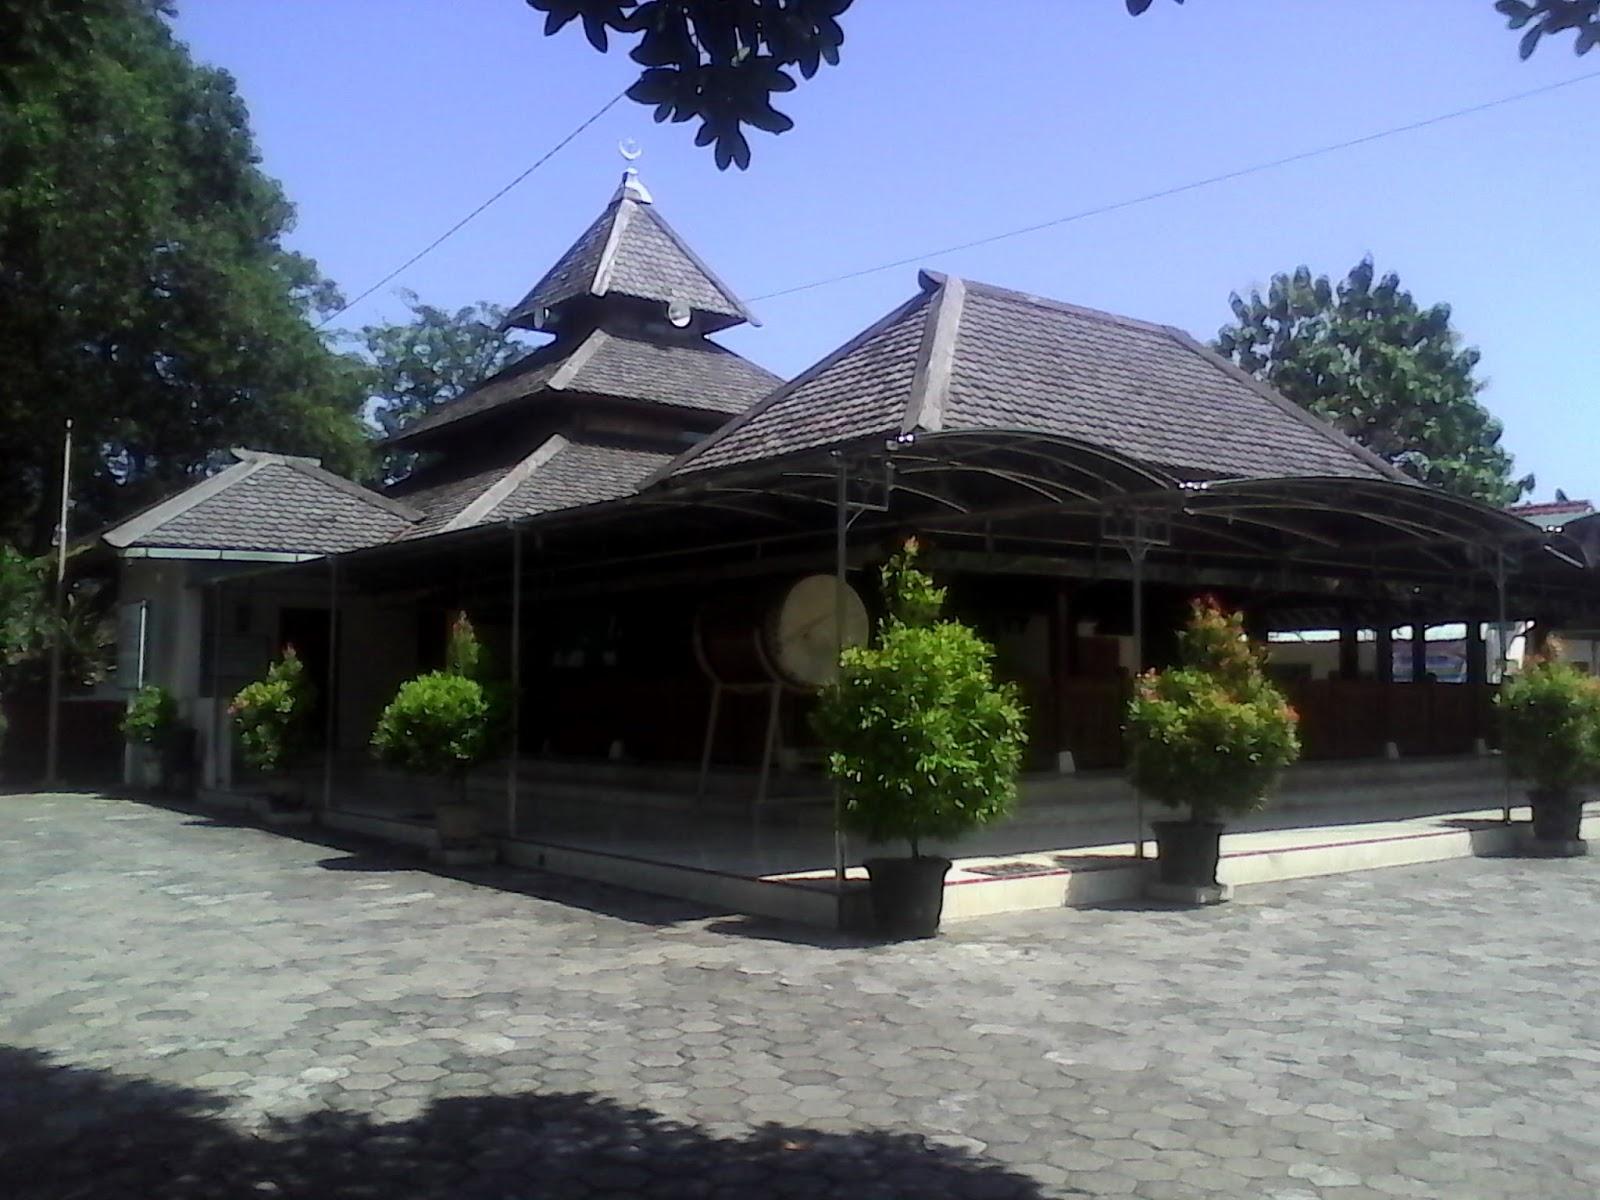 Masjid Kuno Taman Madiun